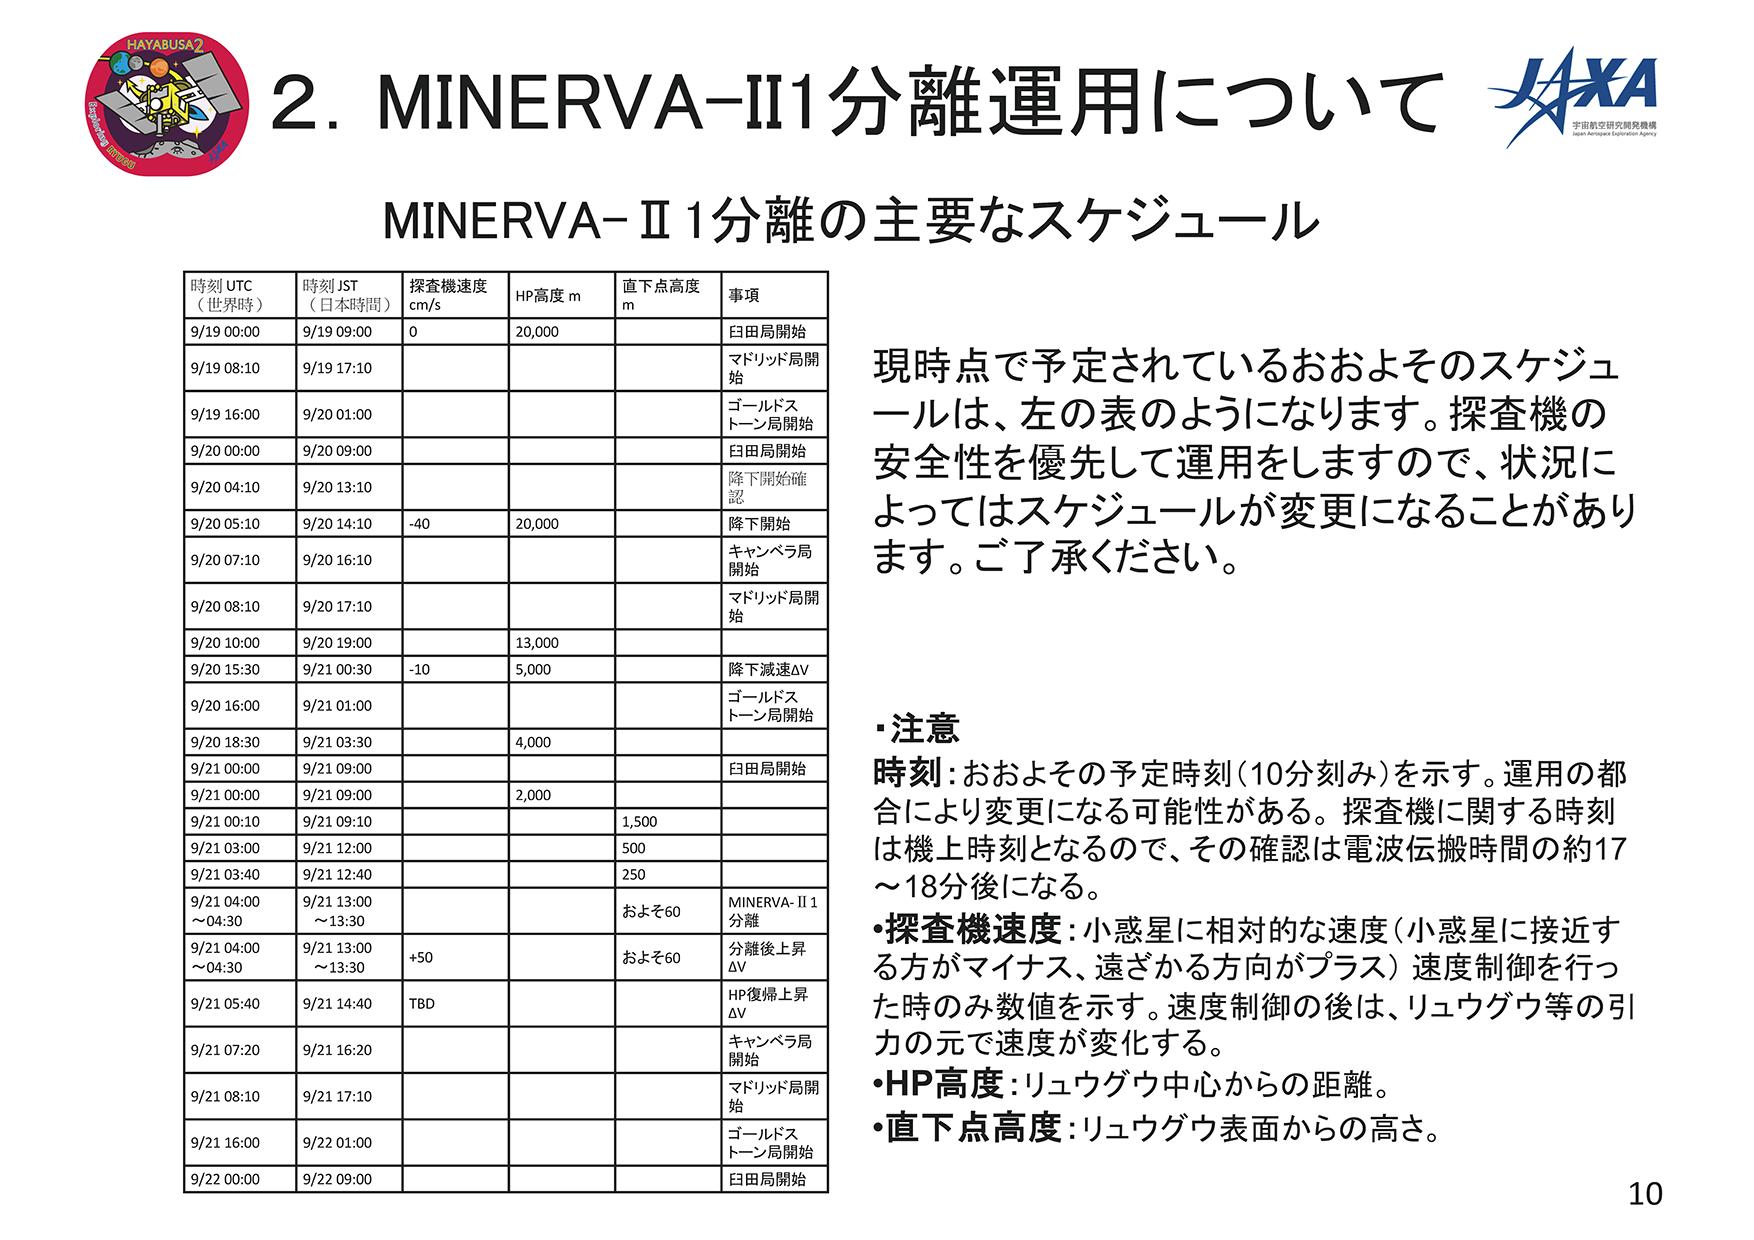 f:id:Imamura:20180921145500p:plain